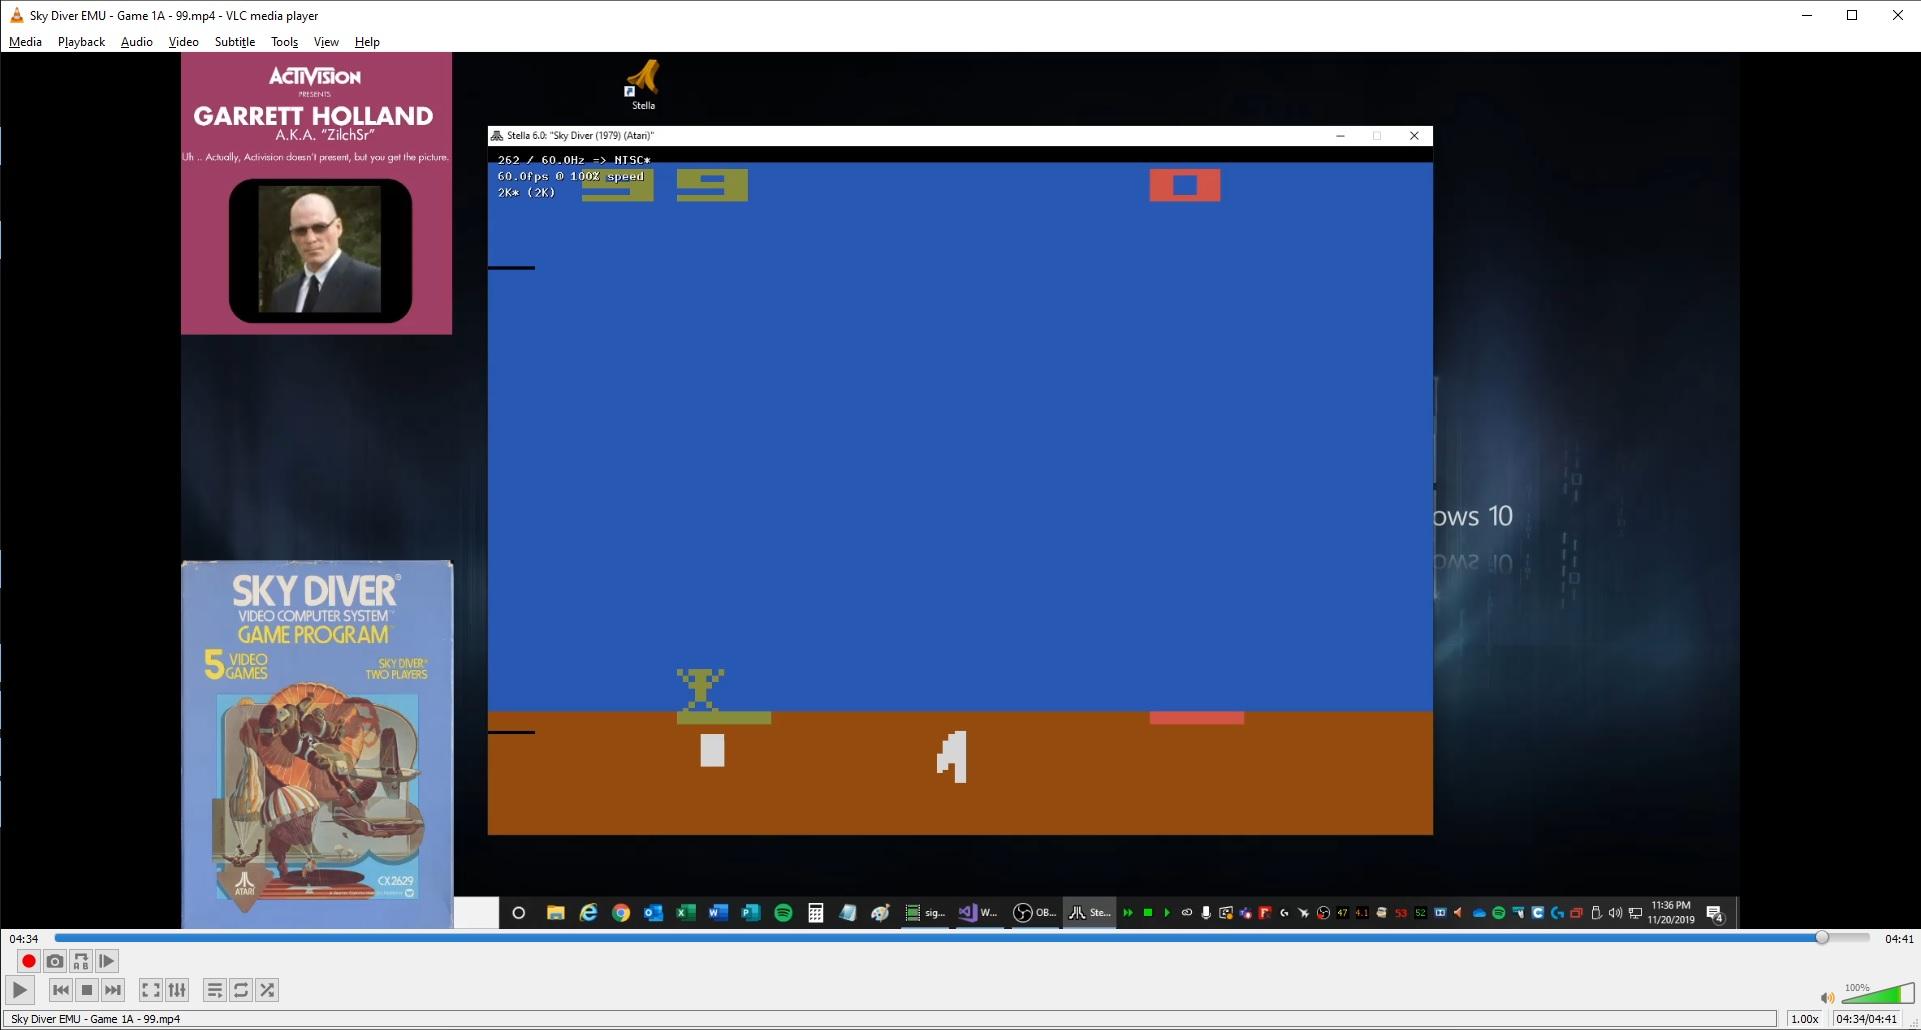 ZilchSr: Sky Diver (Atari 2600 Emulated Expert/A Mode) 99 points on 2019-11-20 22:40:37